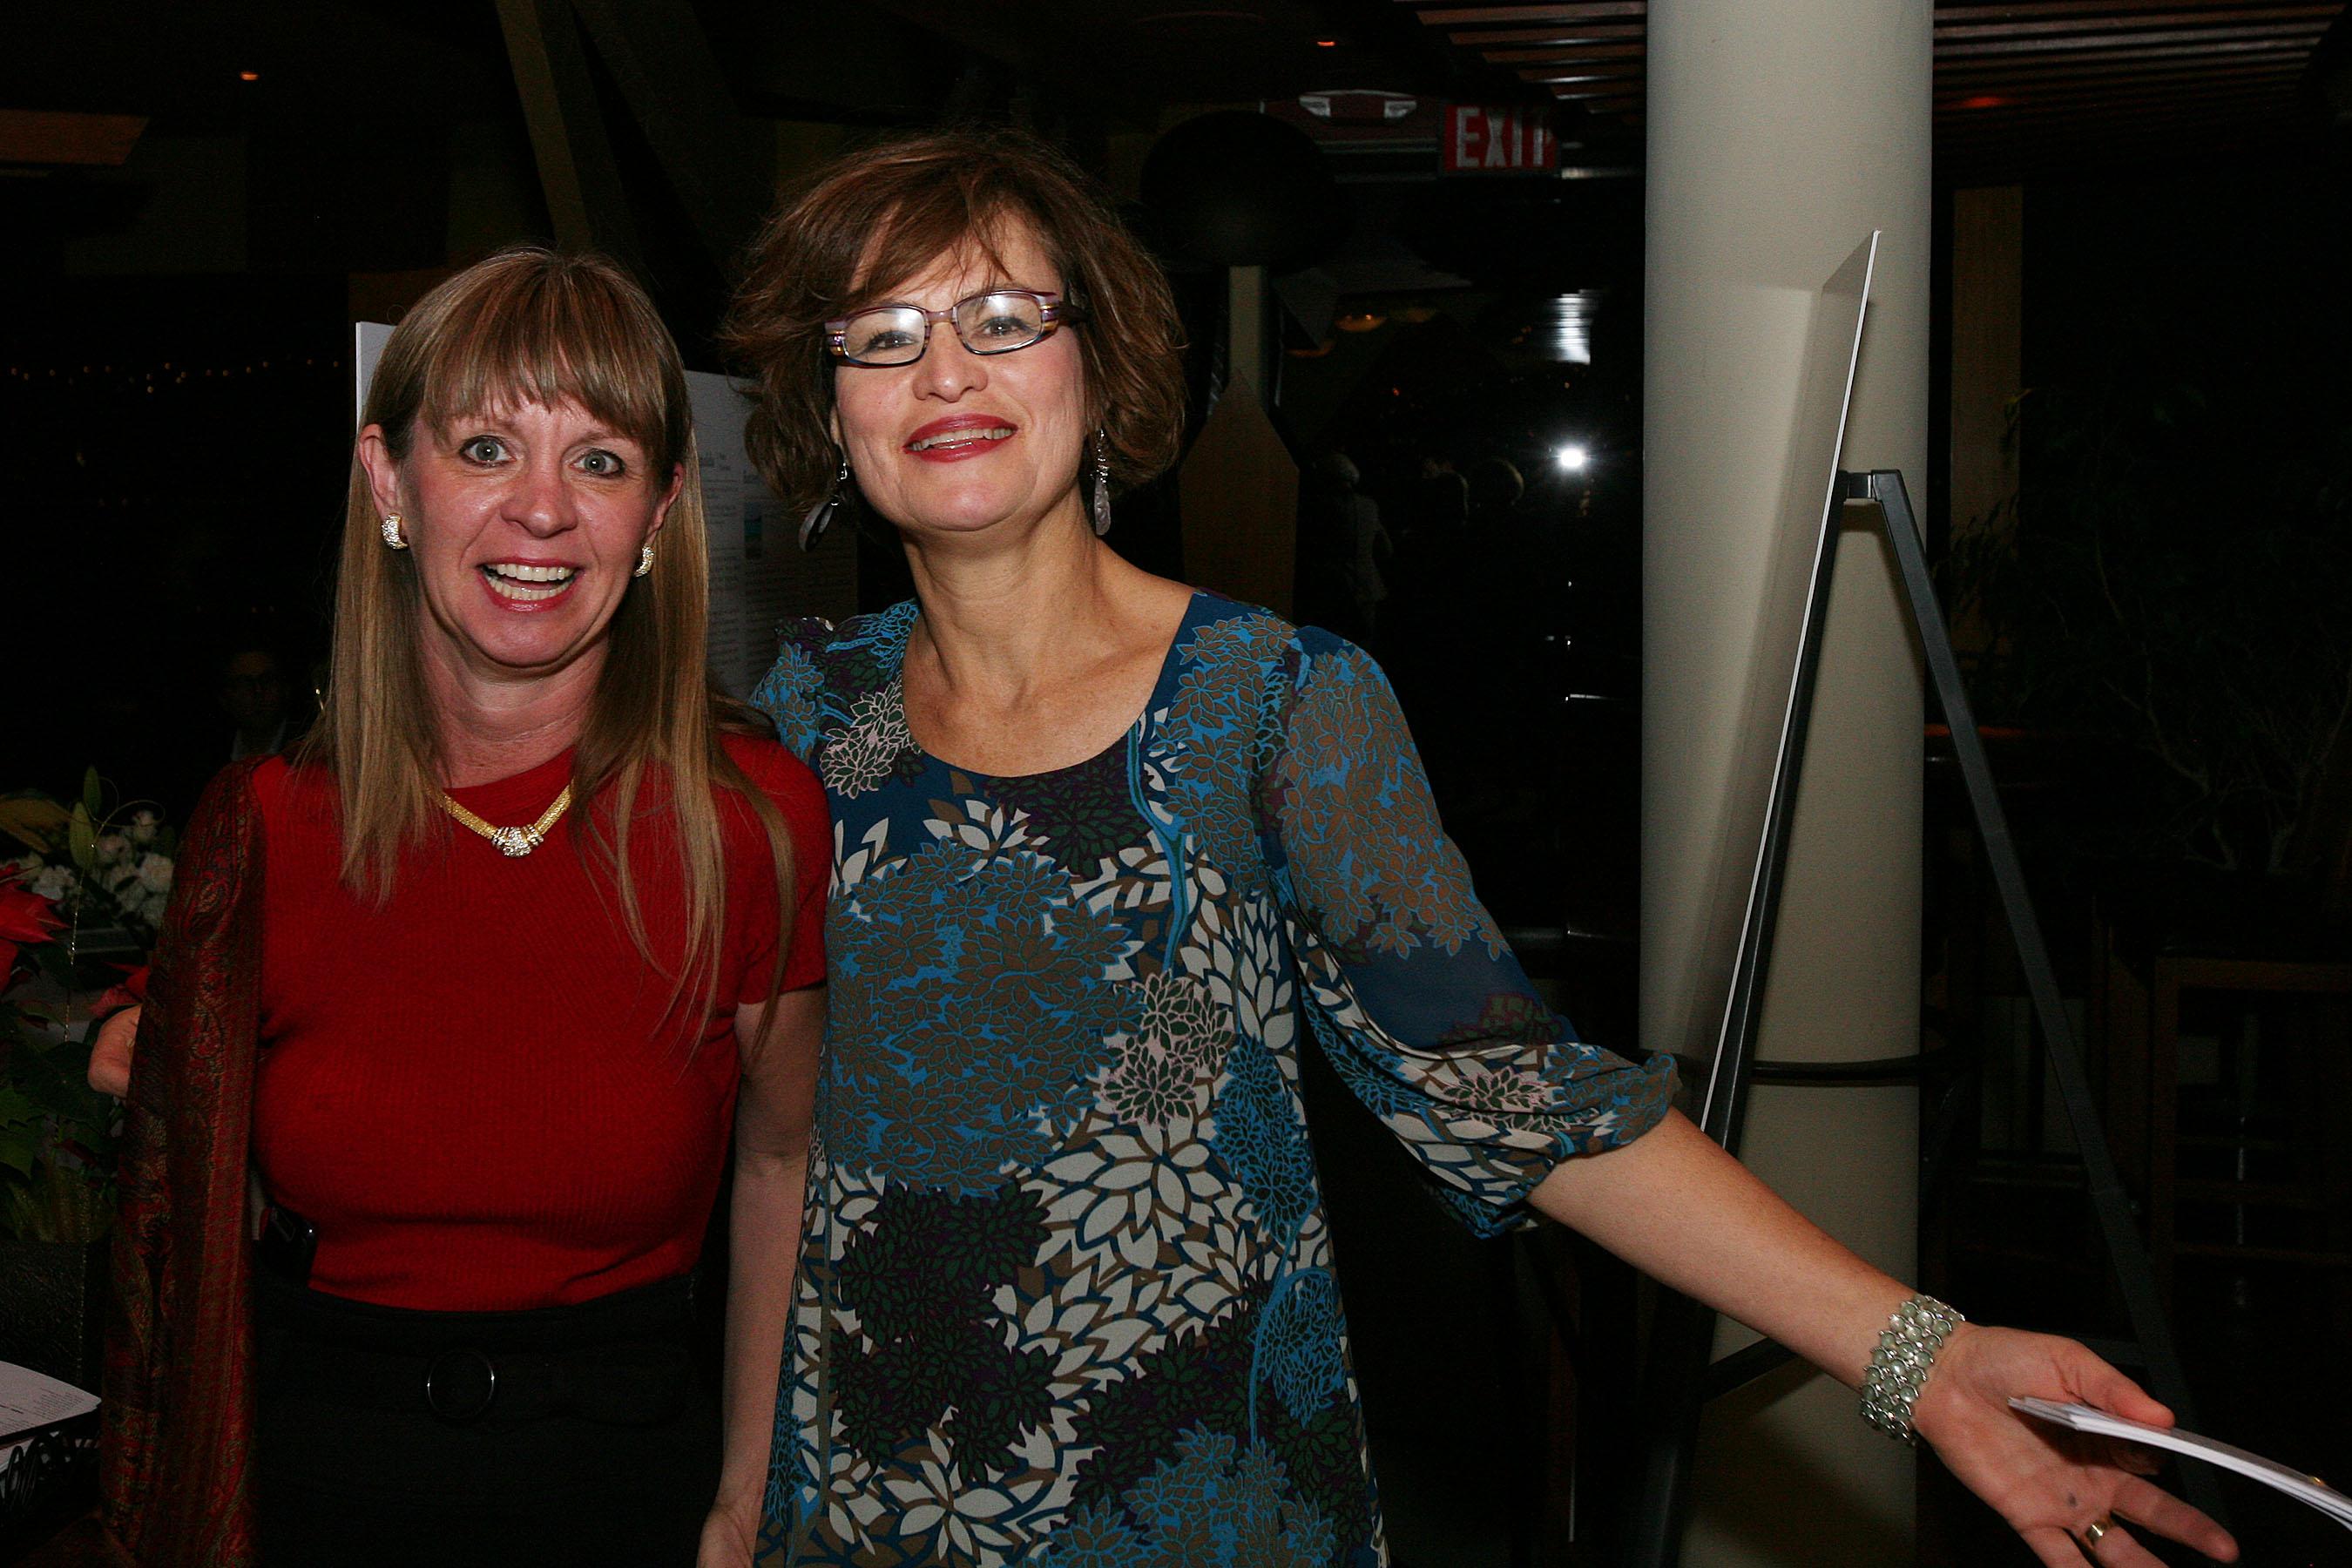 Jacquie Klose - AIC Operations Manager and Lisa Eltinge - Development Consultant